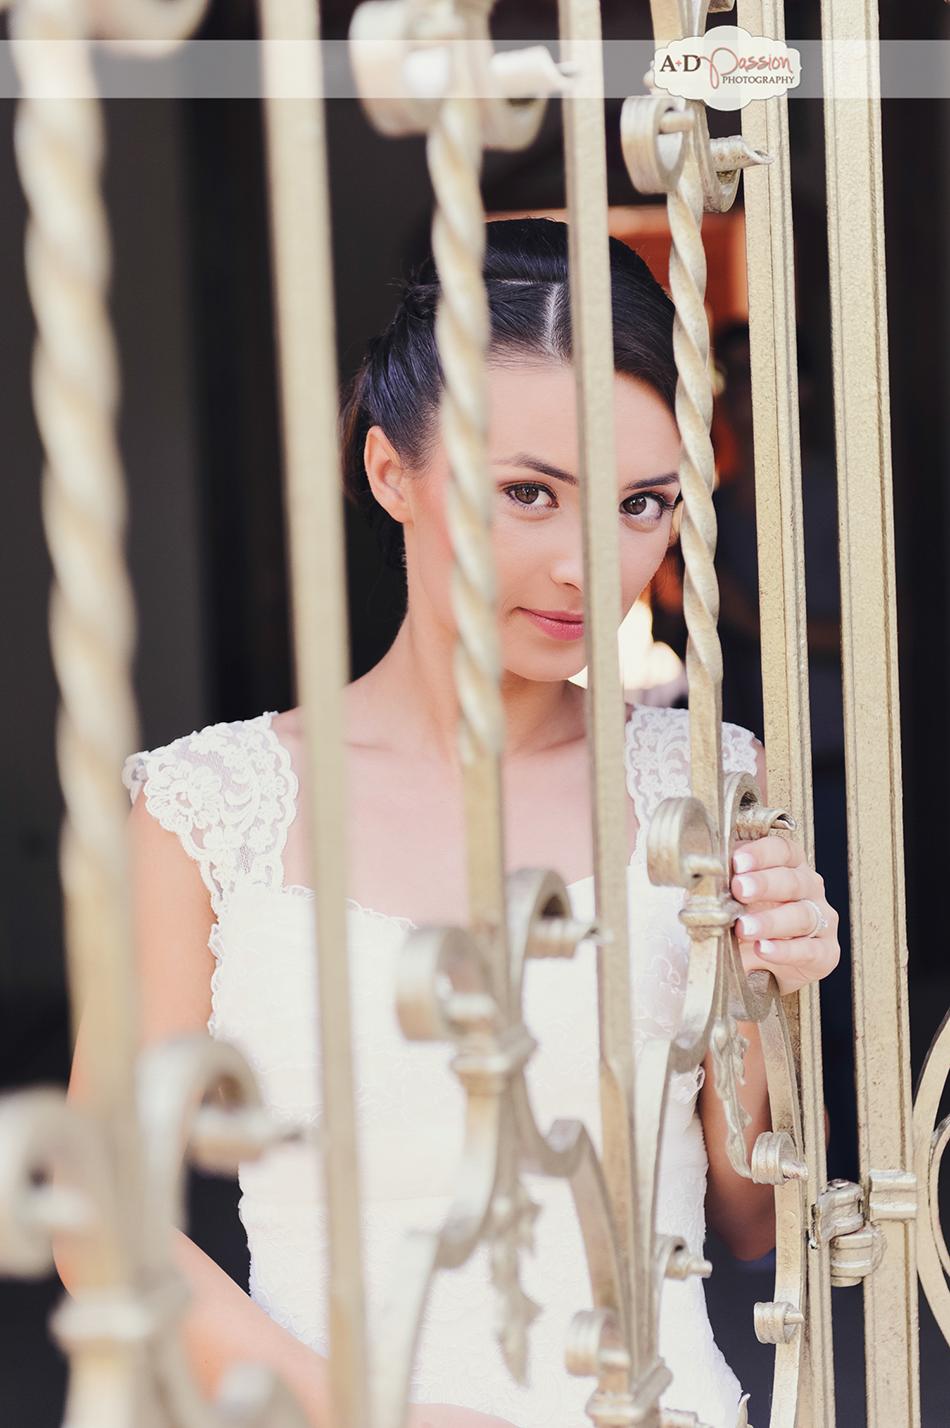 AD Passion Photography | 20130804_ana+calin_fotografie-vintage_fotograf-nunta-oradea_fotograf-profesionist_0081 | Adelin, Dida, fotograf profesionist, fotograf de nunta, fotografie de nunta, fotograf Timisoara, fotograf Craiova, fotograf Bucuresti, fotograf Arad, nunta Timisoara, nunta Arad, nunta Bucuresti, nunta Craiova